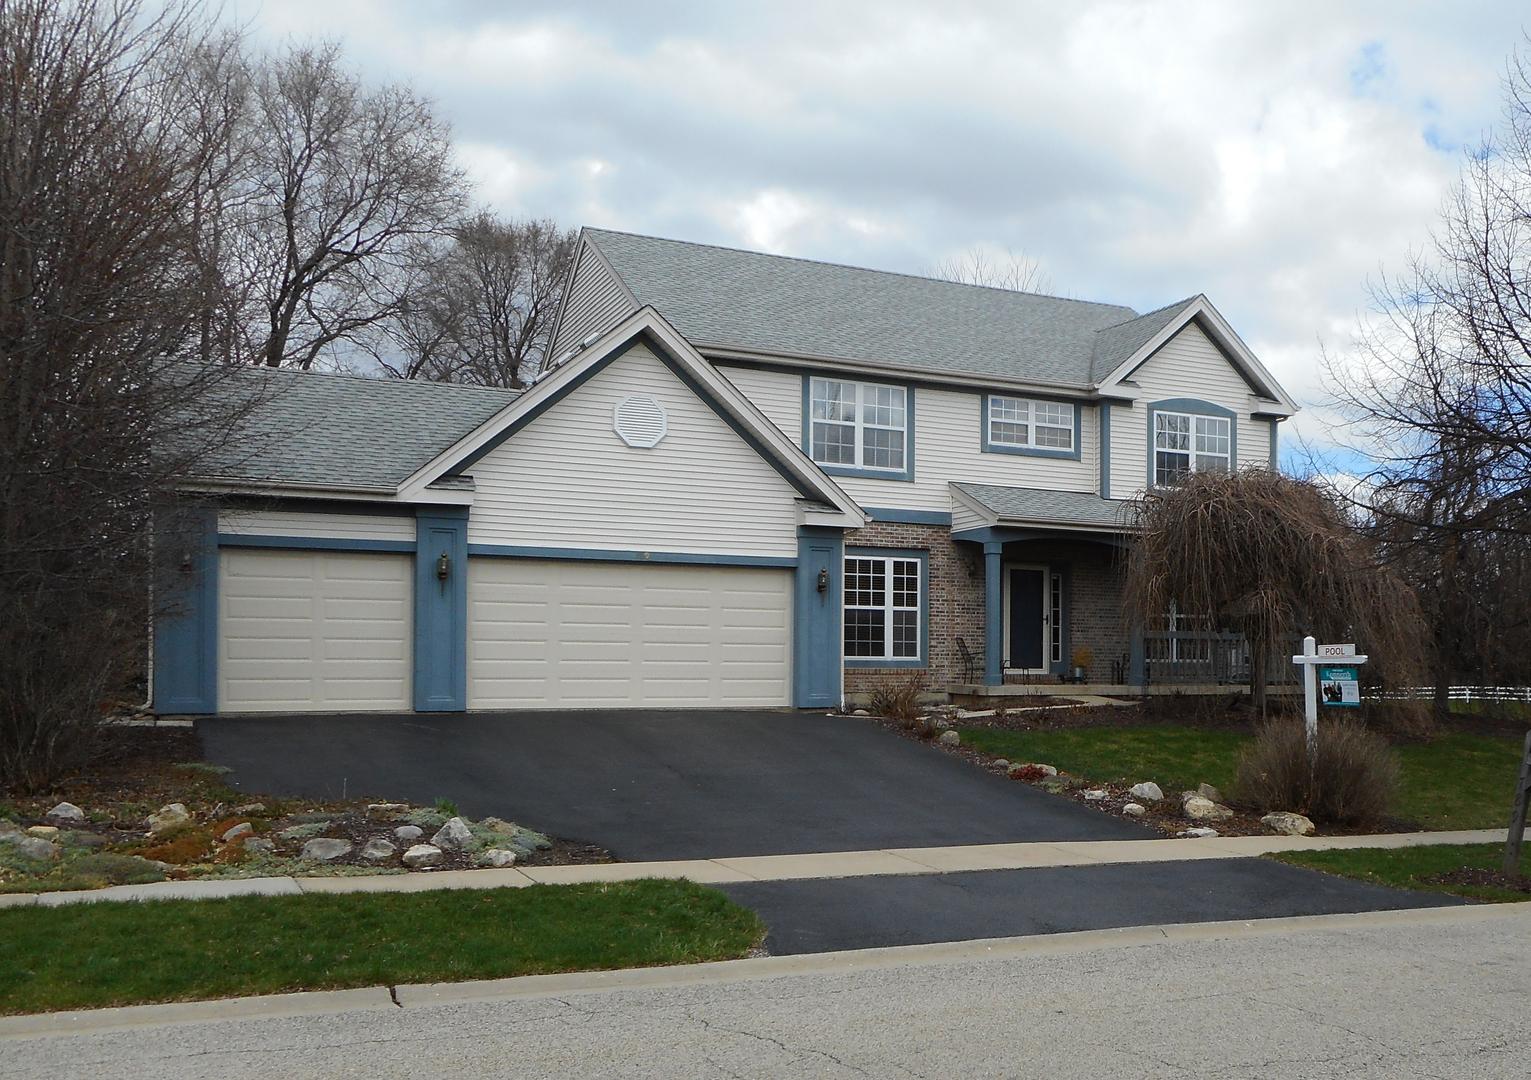 789 Lipizzan Lane, Wauconda, Illinois 60084